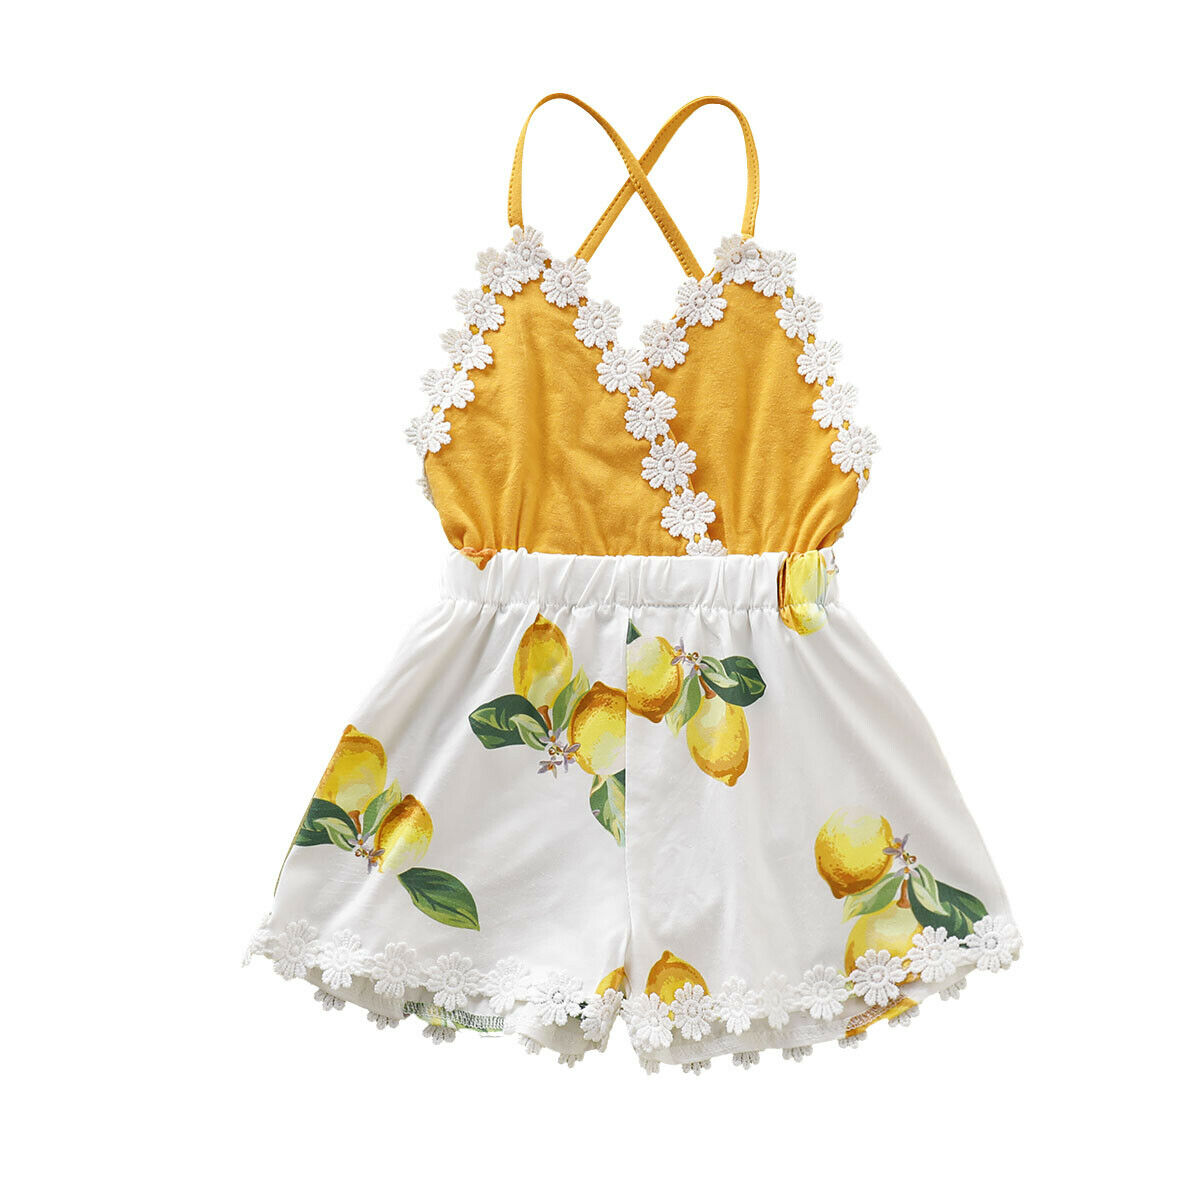 Pudcoco 2019 Stap Pelele de tirantes para bebé niña limón Sunsuit Floral ropa de verano lindos trajes ropa Casual